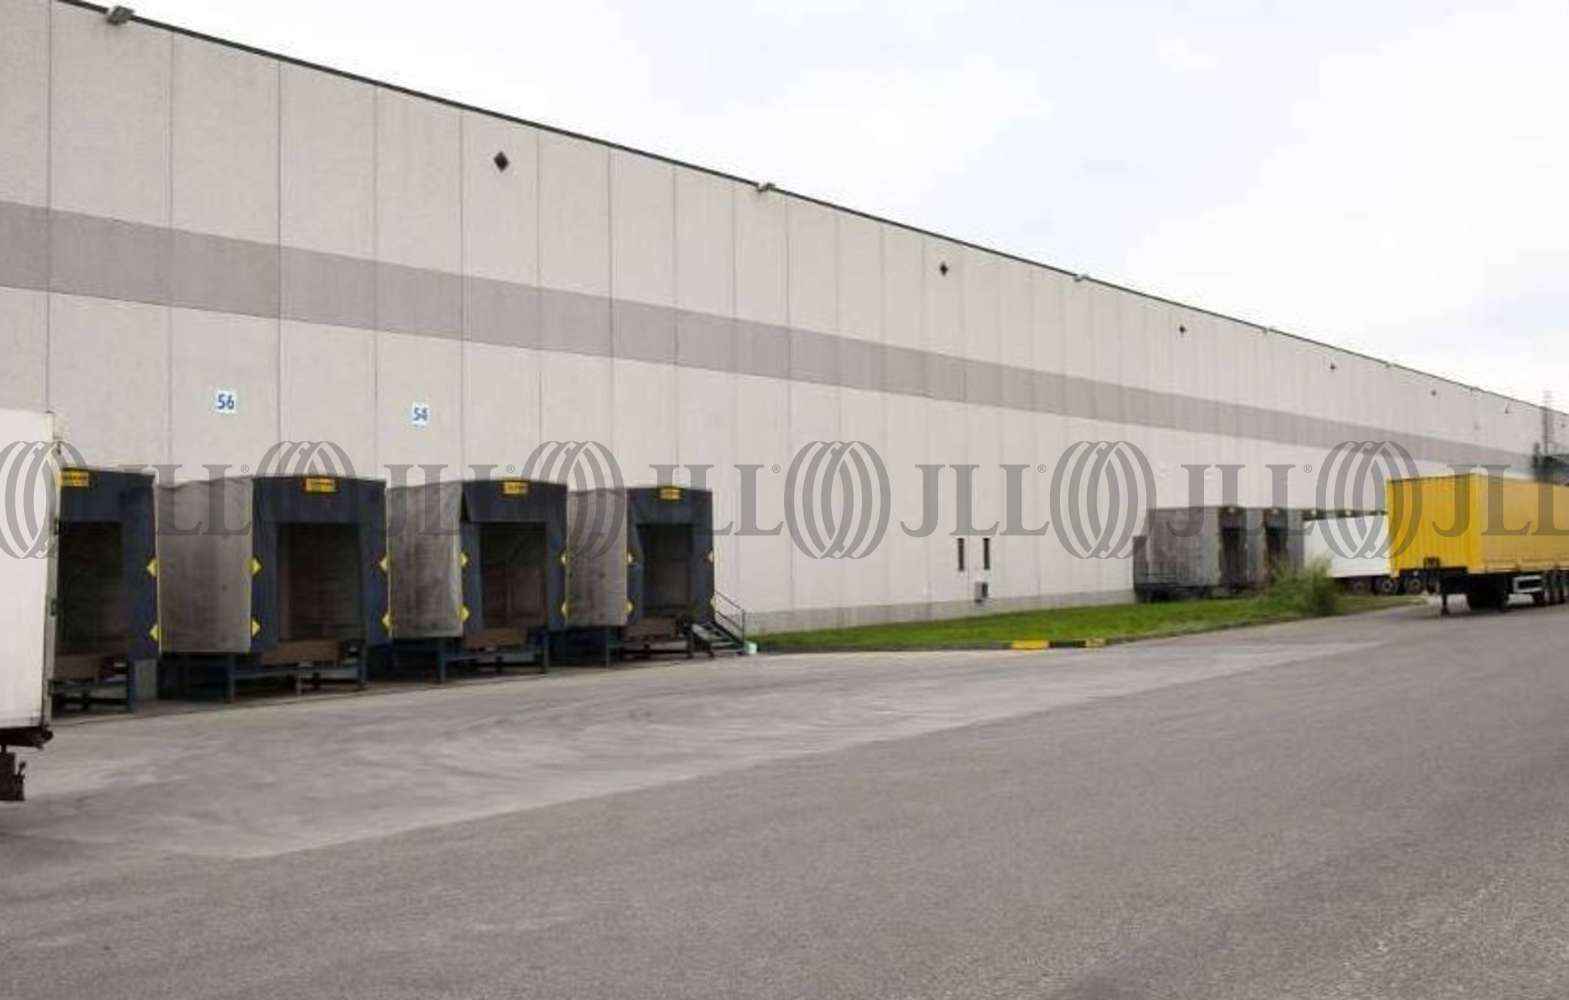 Magazzini industriali e logistici Santa cristina e bissone, 27010 - Pavia Santa Cristina